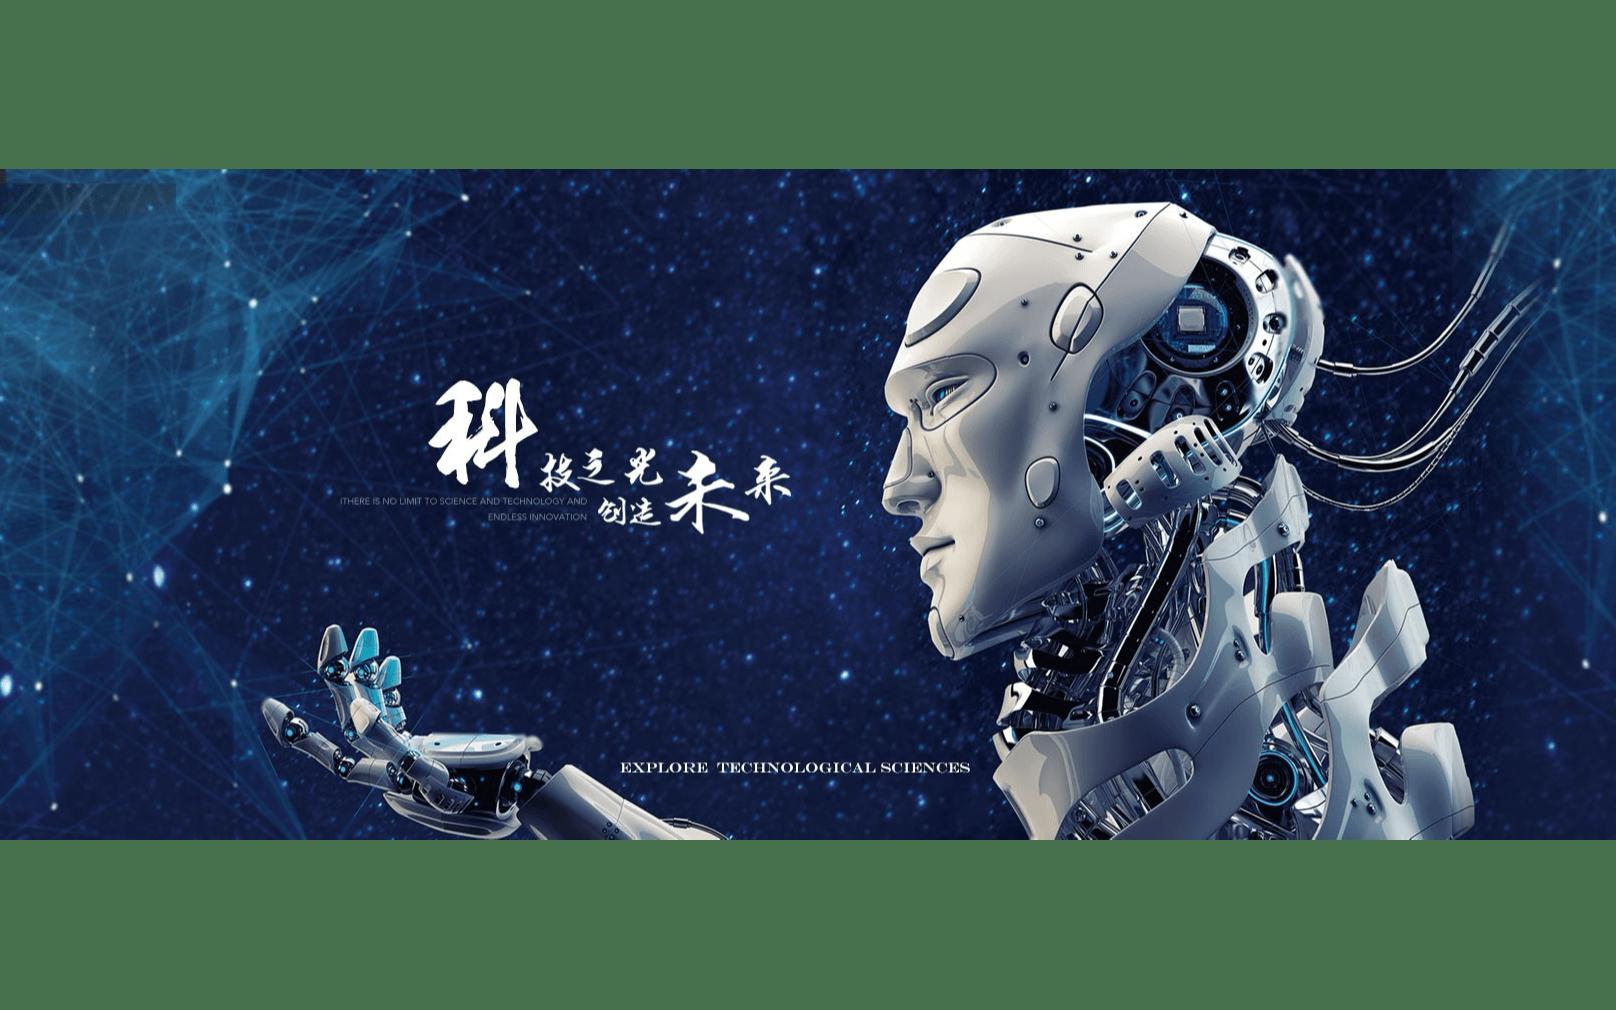 2019--Python编程与机器(深度)学习算法原理及案例实现|6月北京